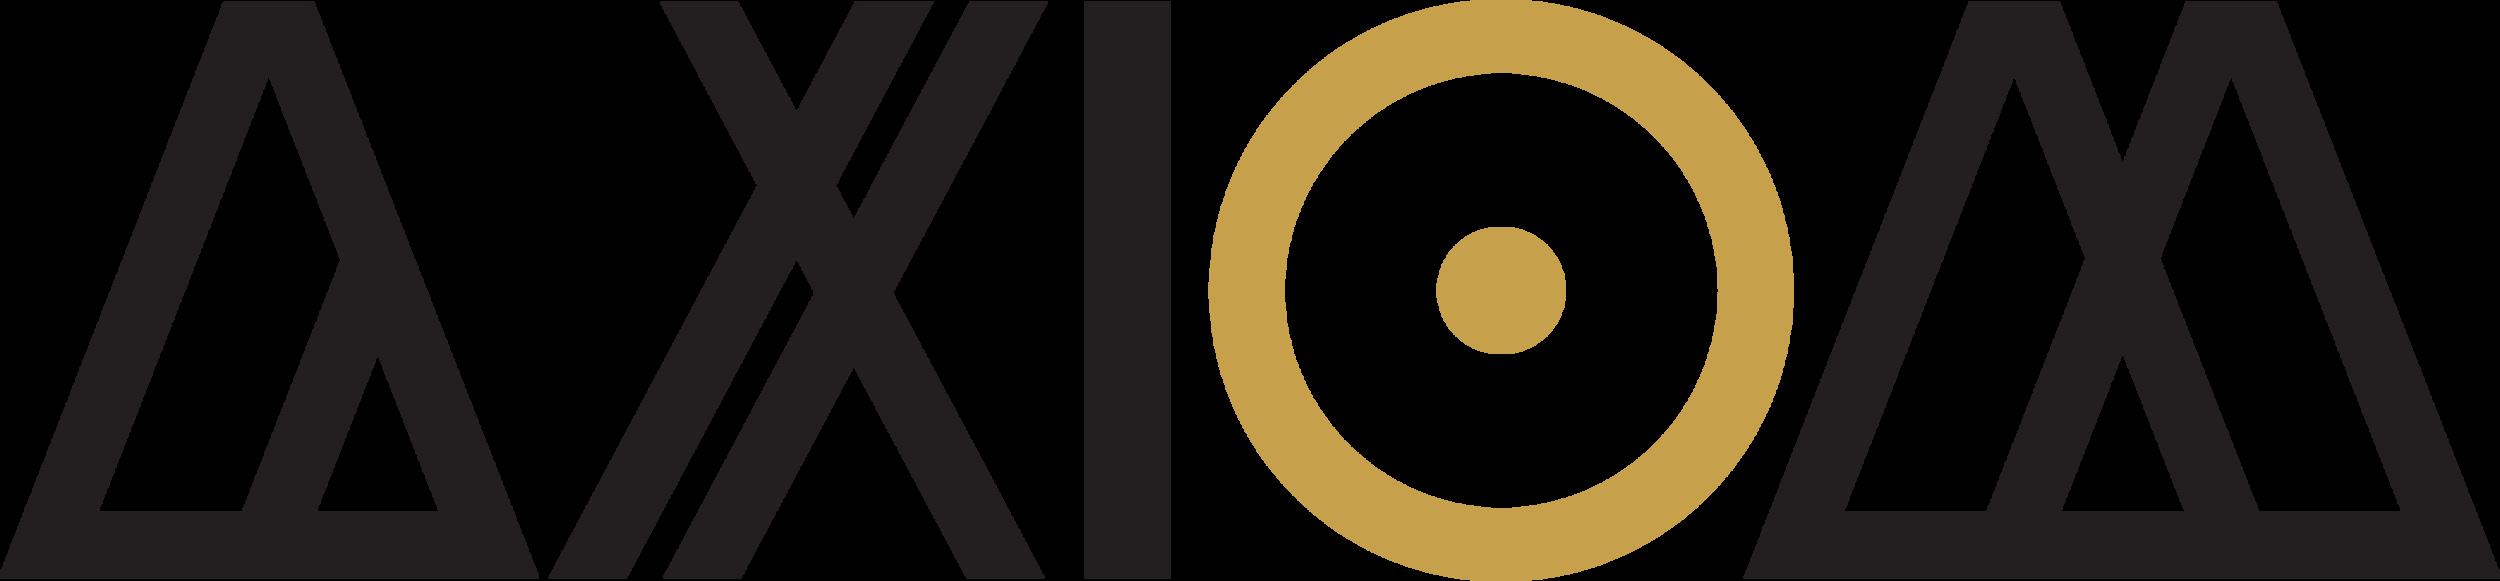 axiomlogo-blkgld.png